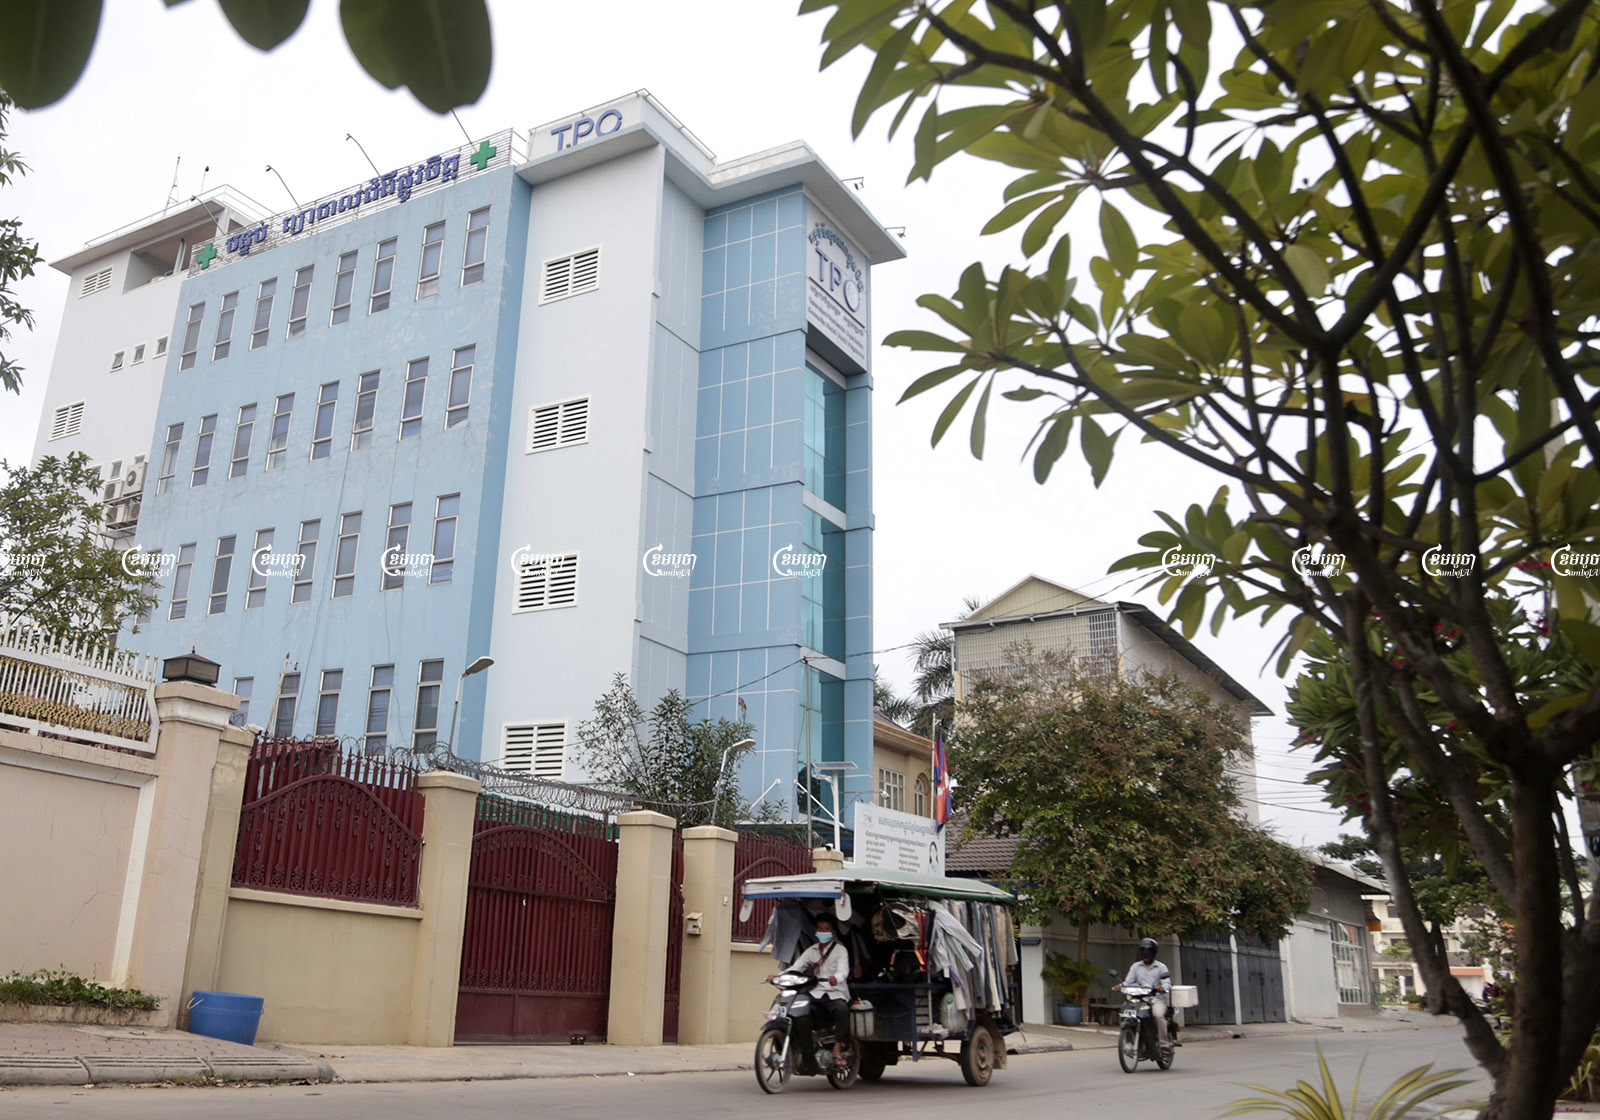 Motorists drive past the TPO building in Phnom Penh, August 28, 2021. CamboJA/ Panha Chhorpoan